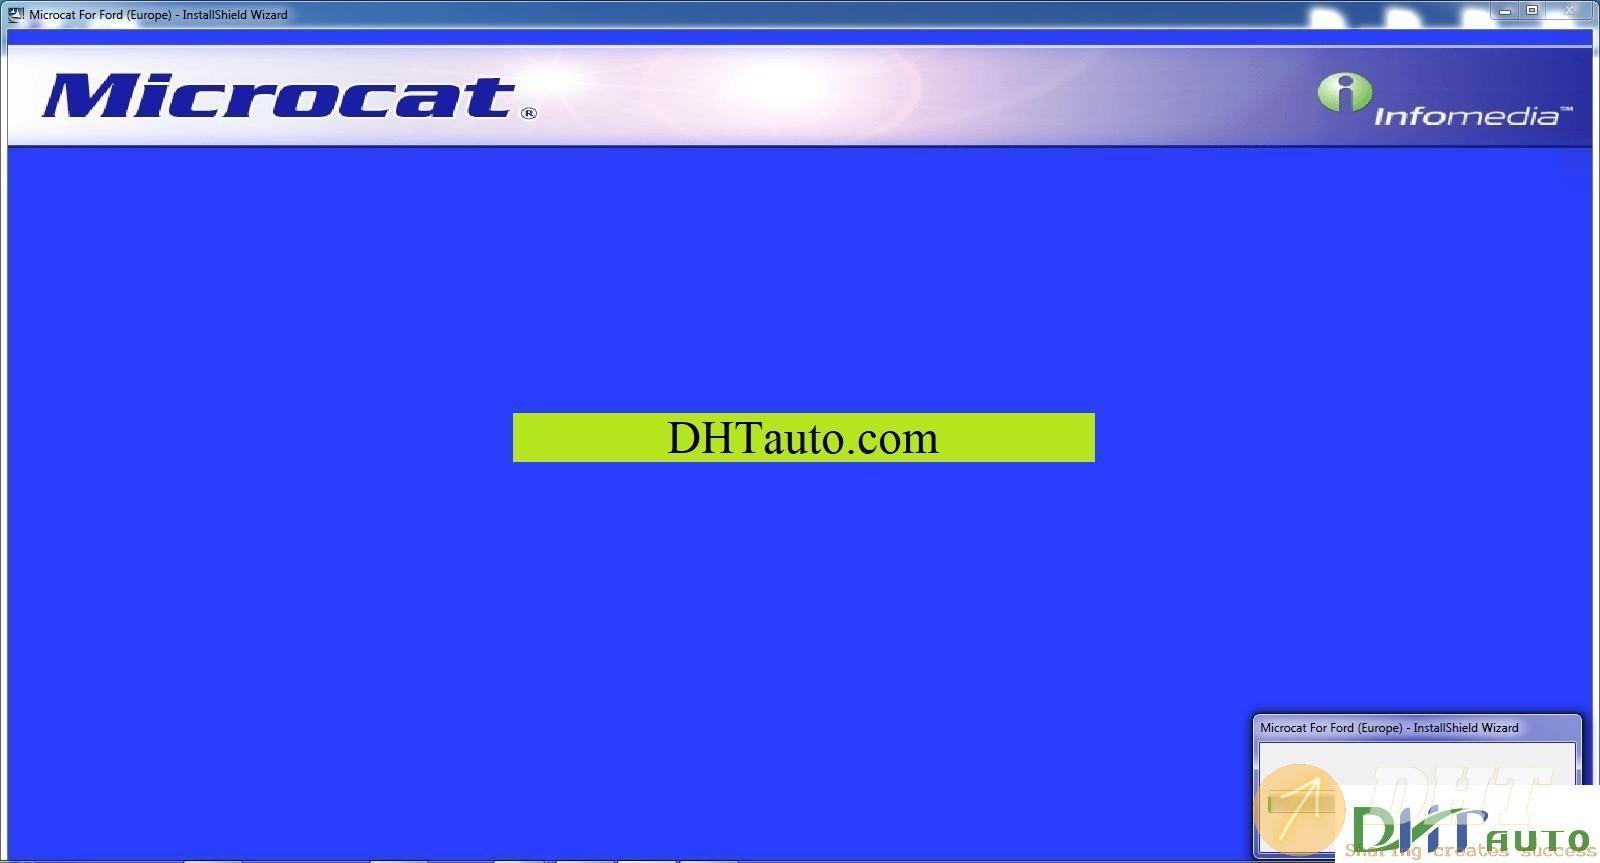 Ford-Microcat-Europe-Instruction-Install-Full-01-2016-8.jpg